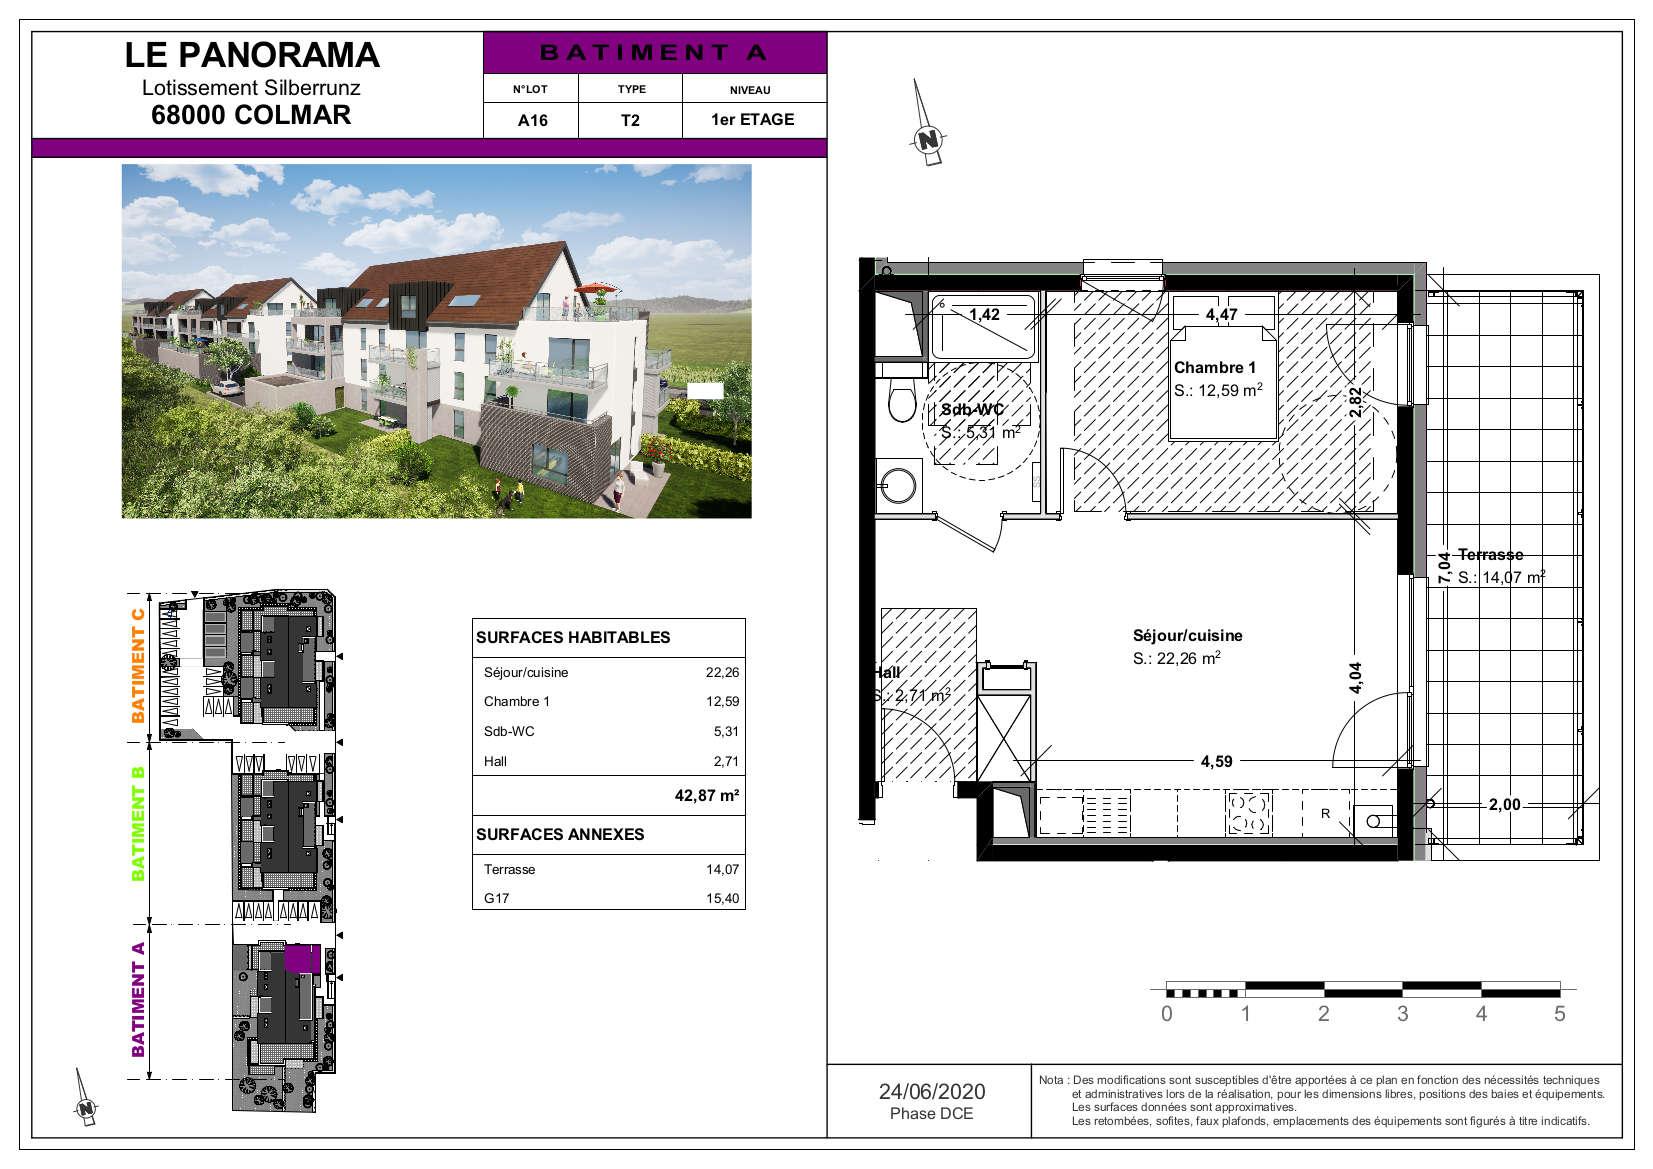 appartement 2 pièces terrasse 14 m² Colmar maraichers Lot A16